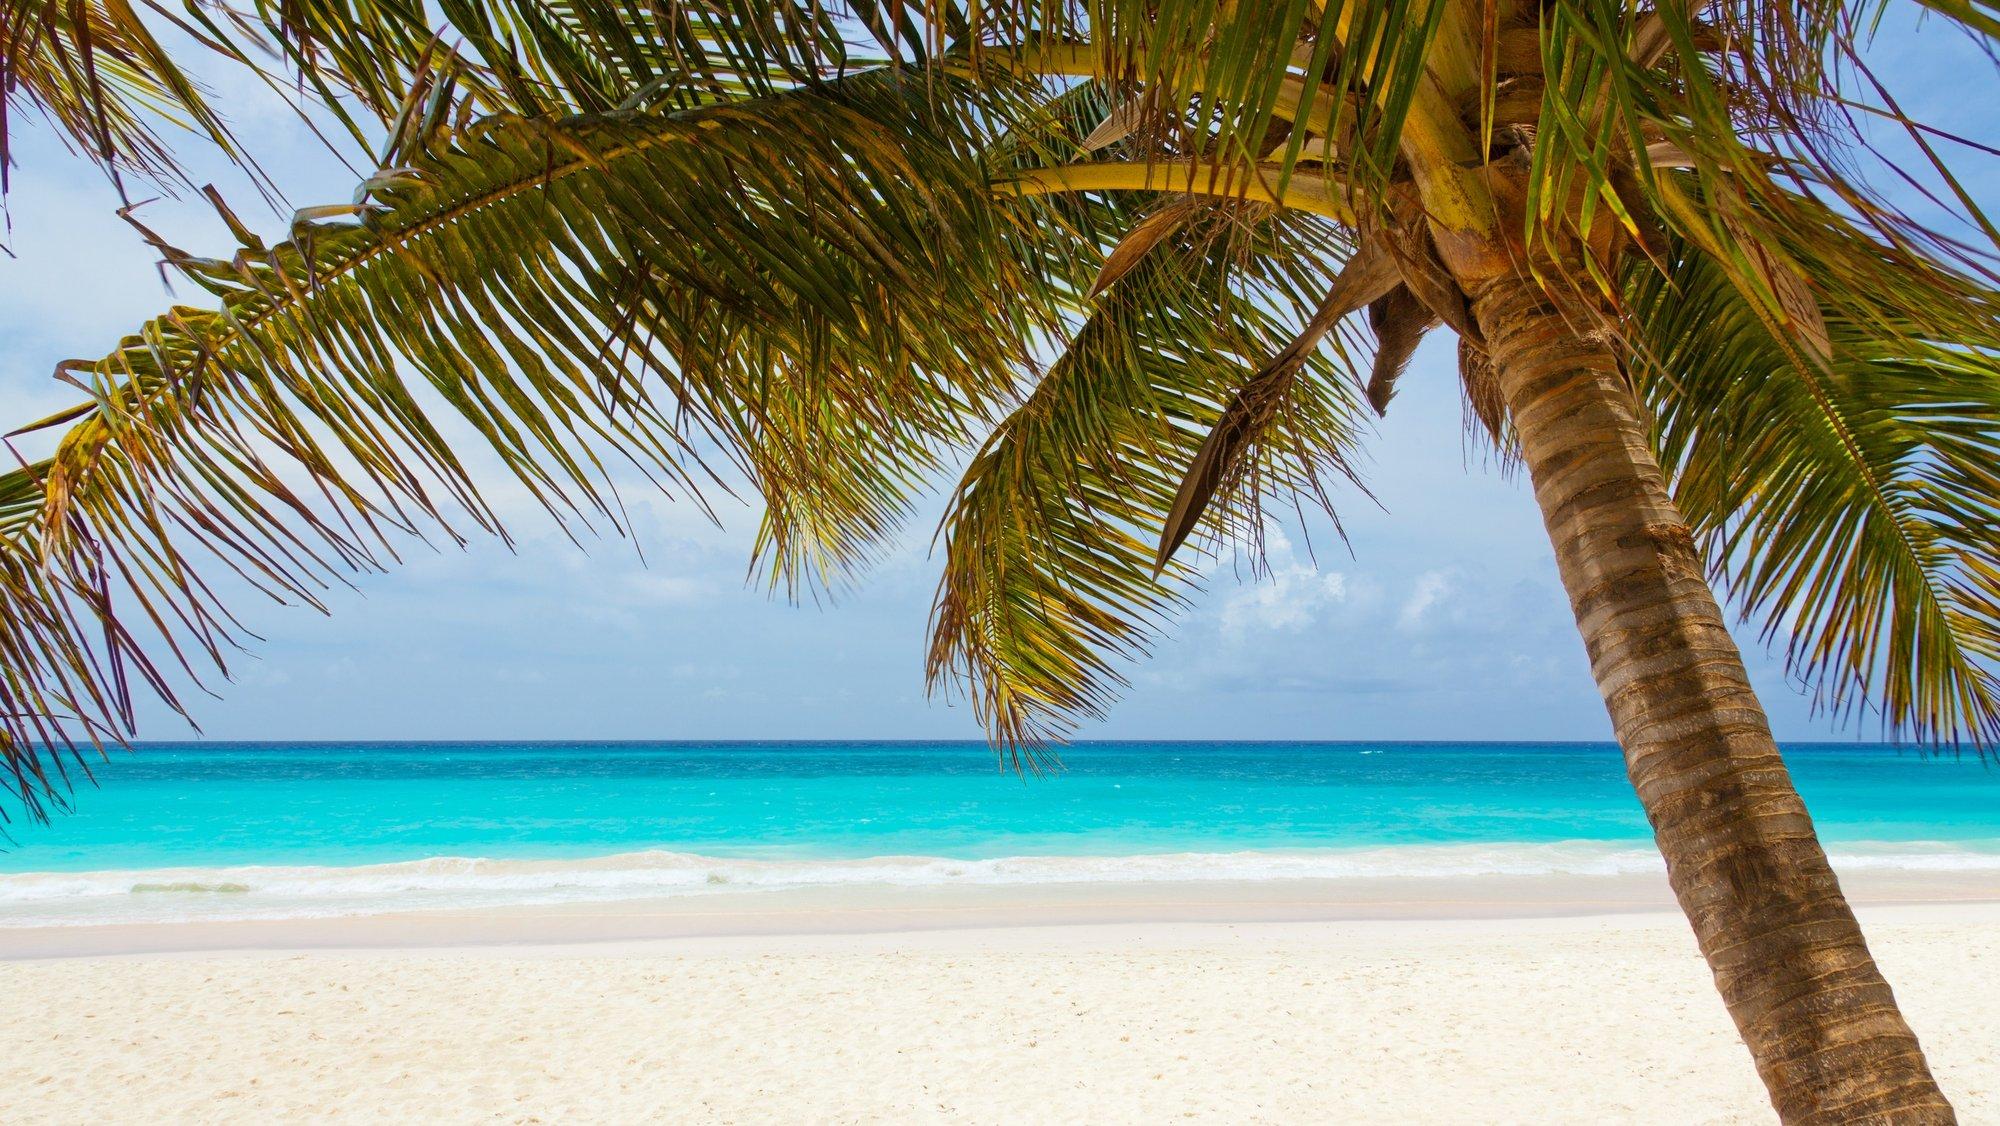 BeachImage2